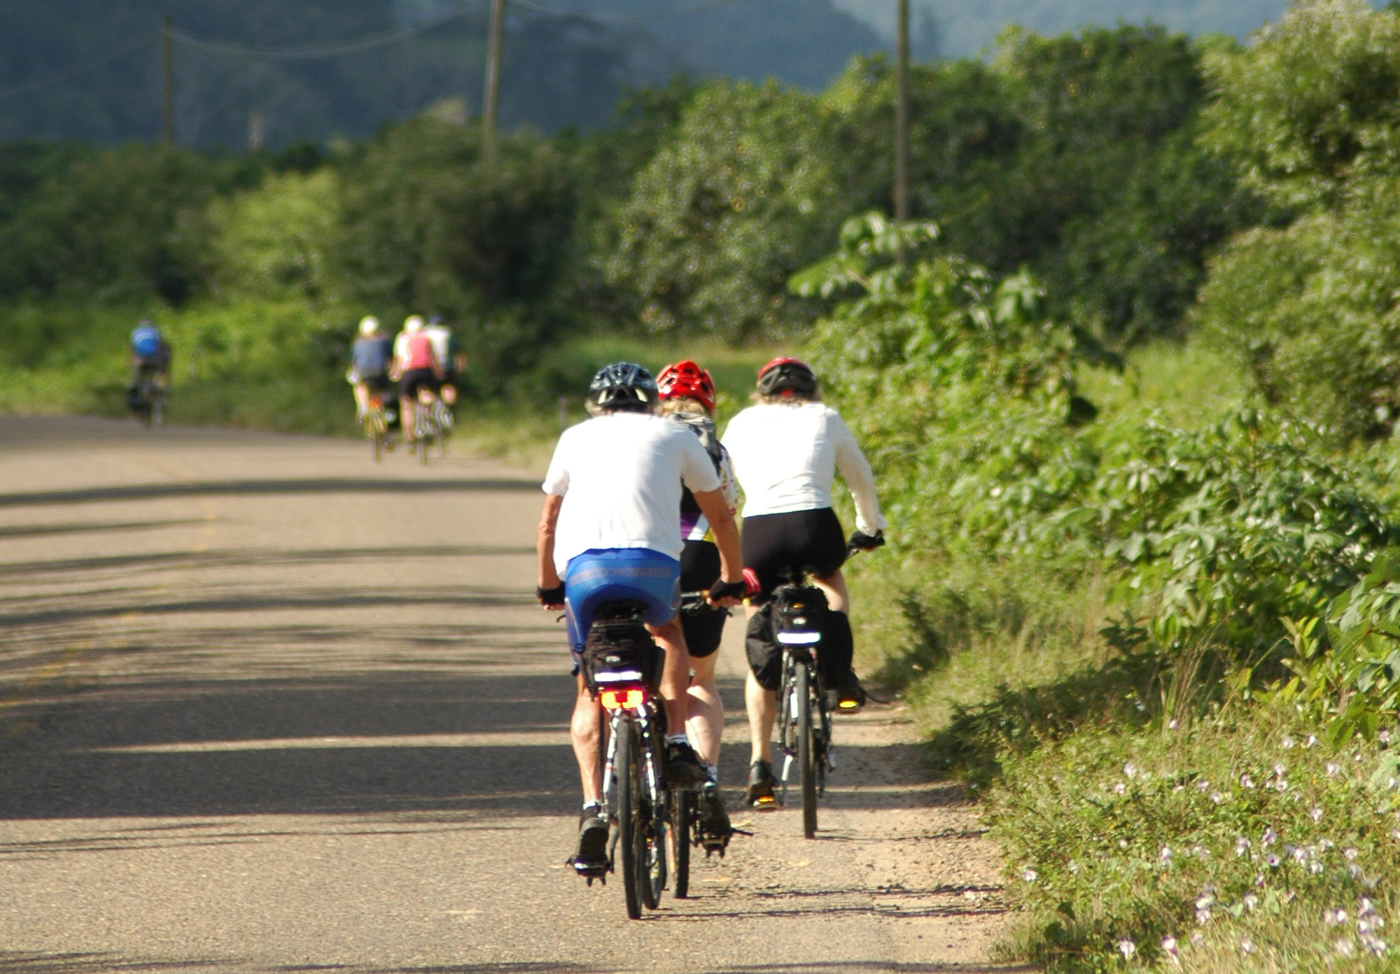 bel07-cyclingruins-free-crop